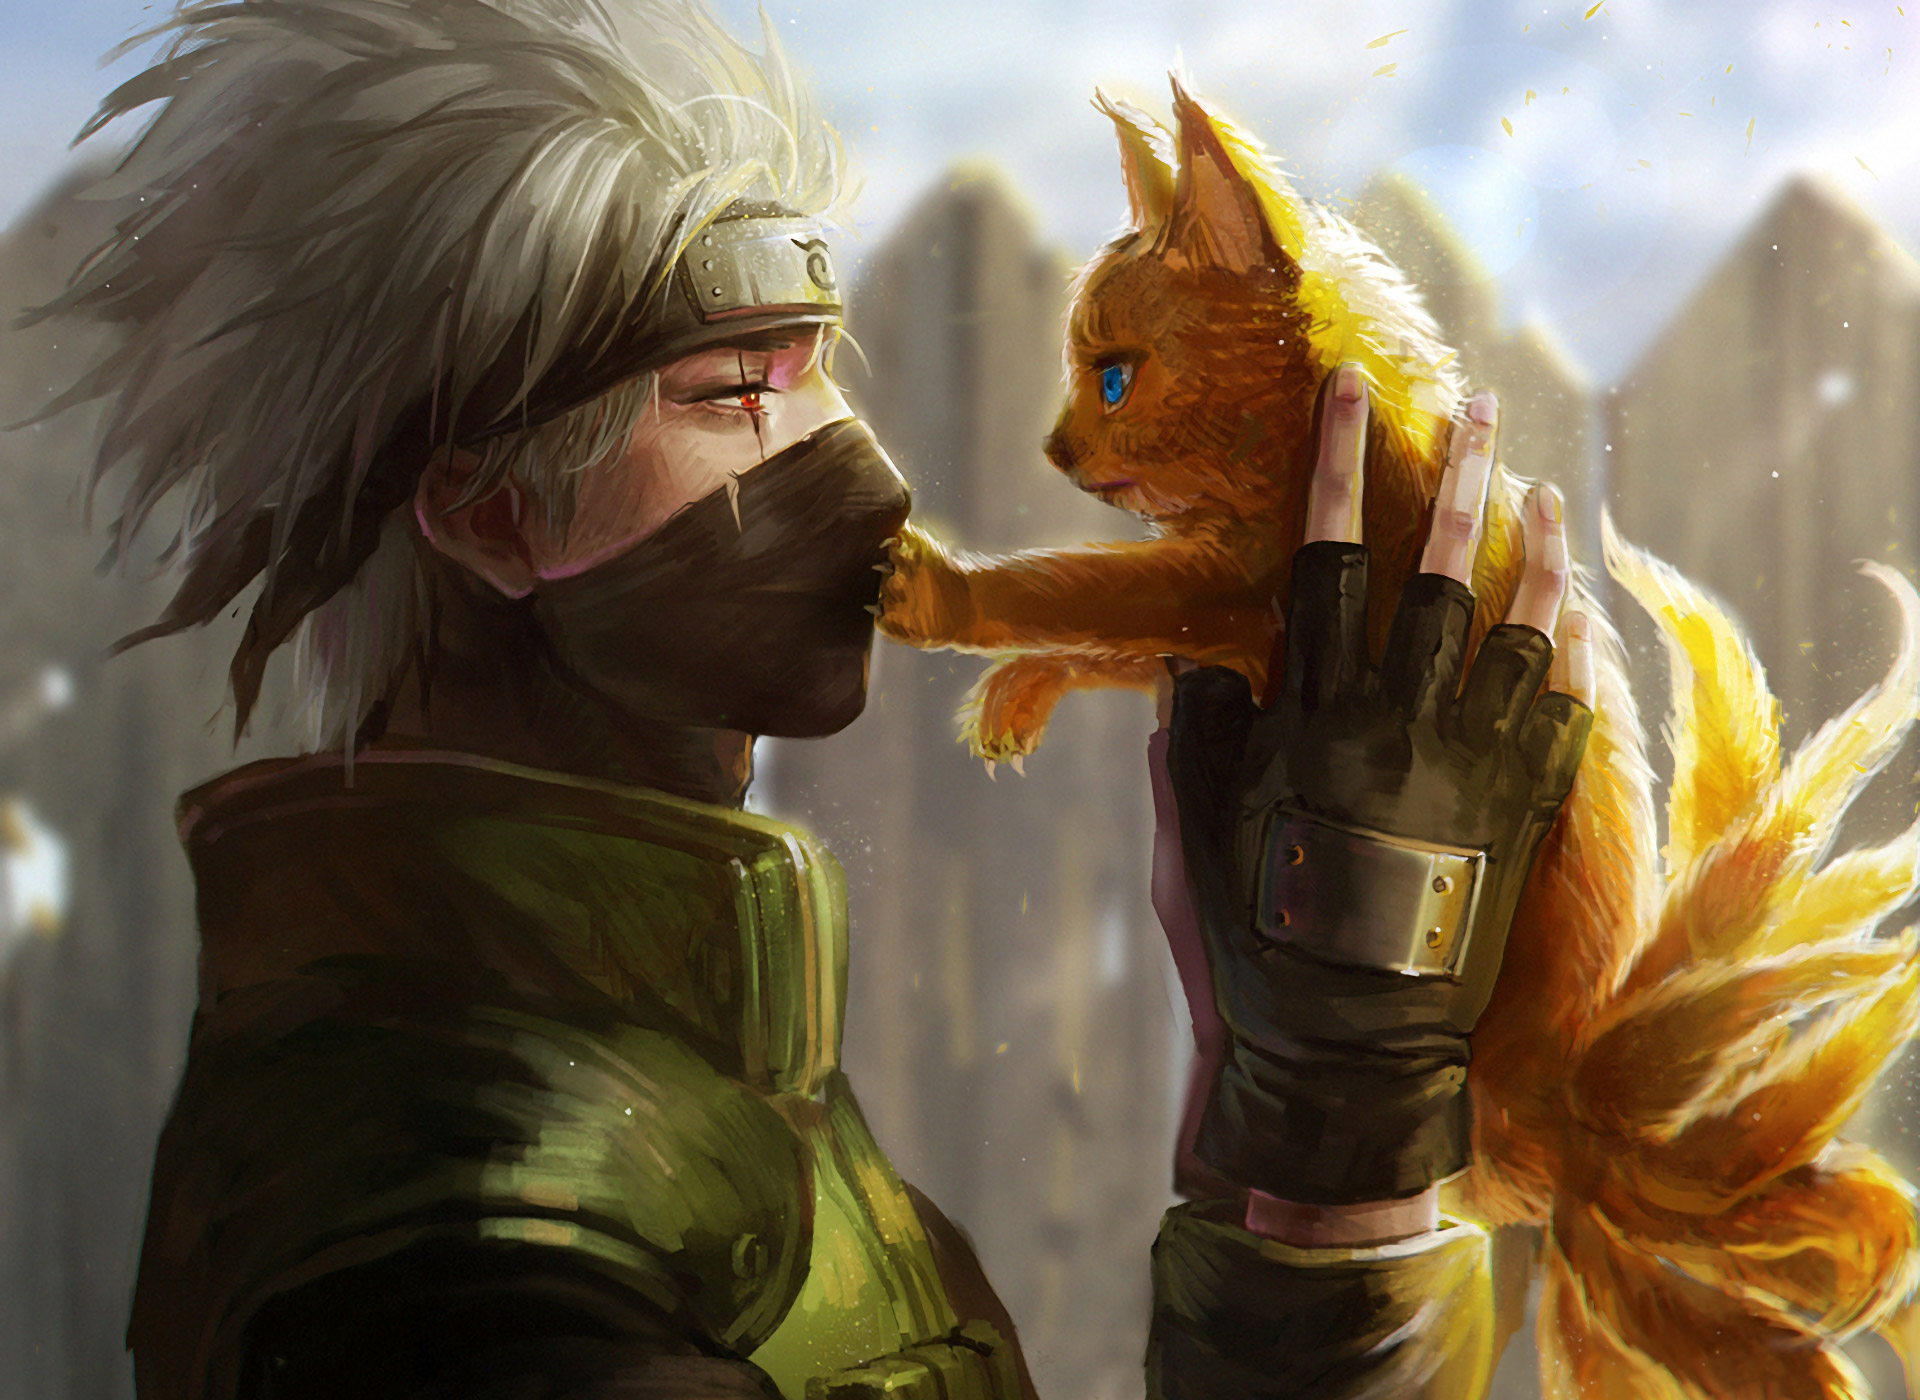 Anime Wallpaper Naruto Artwork